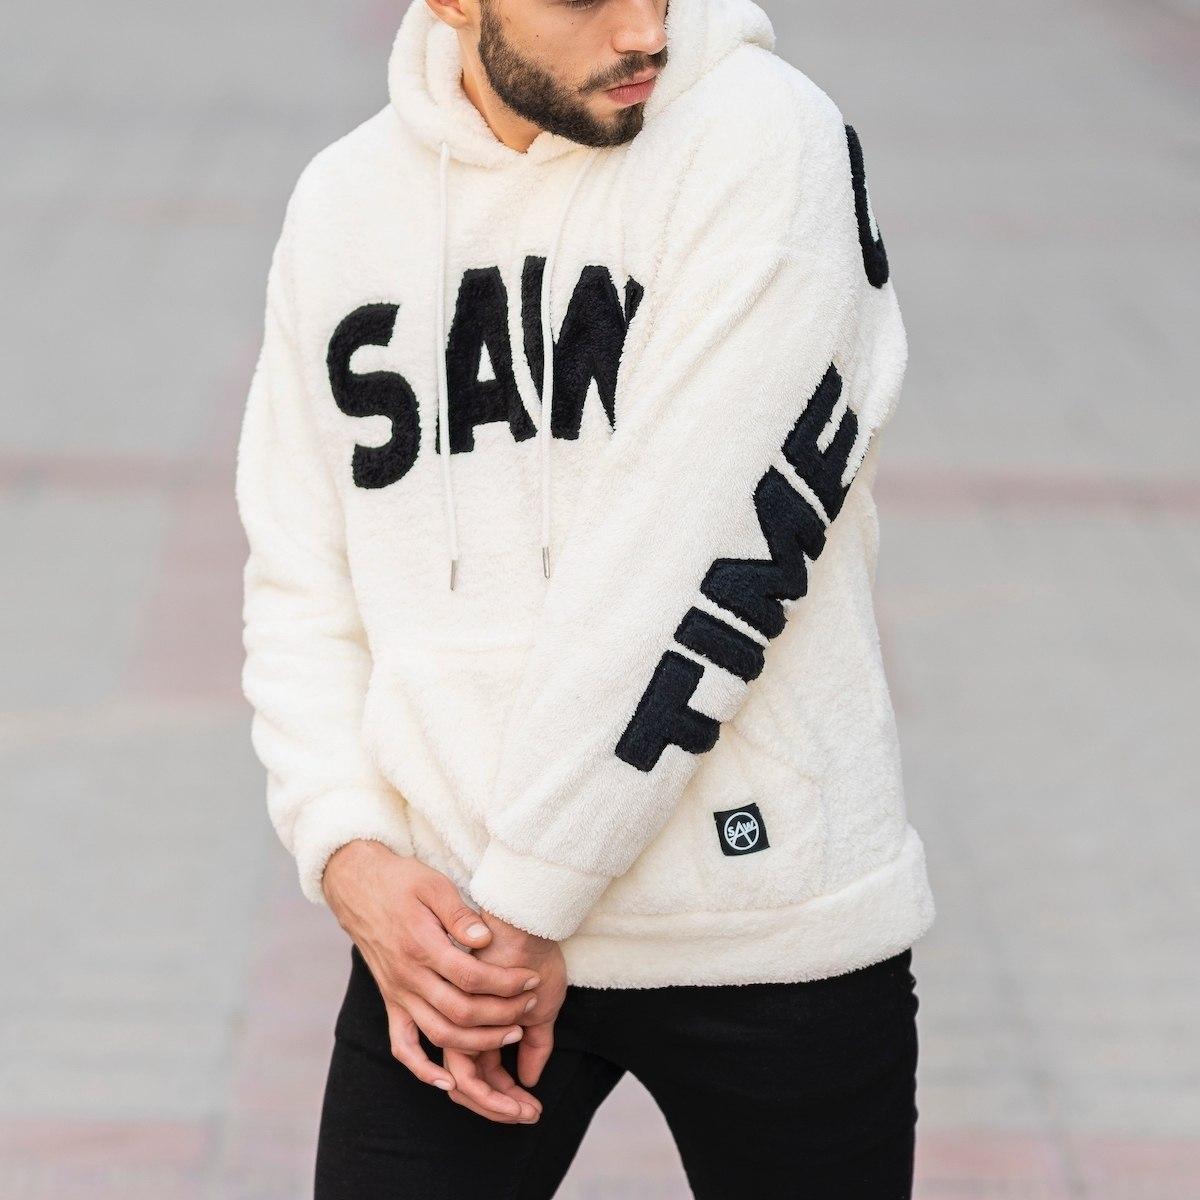 Men's Saw Hooded Sweatshirt...